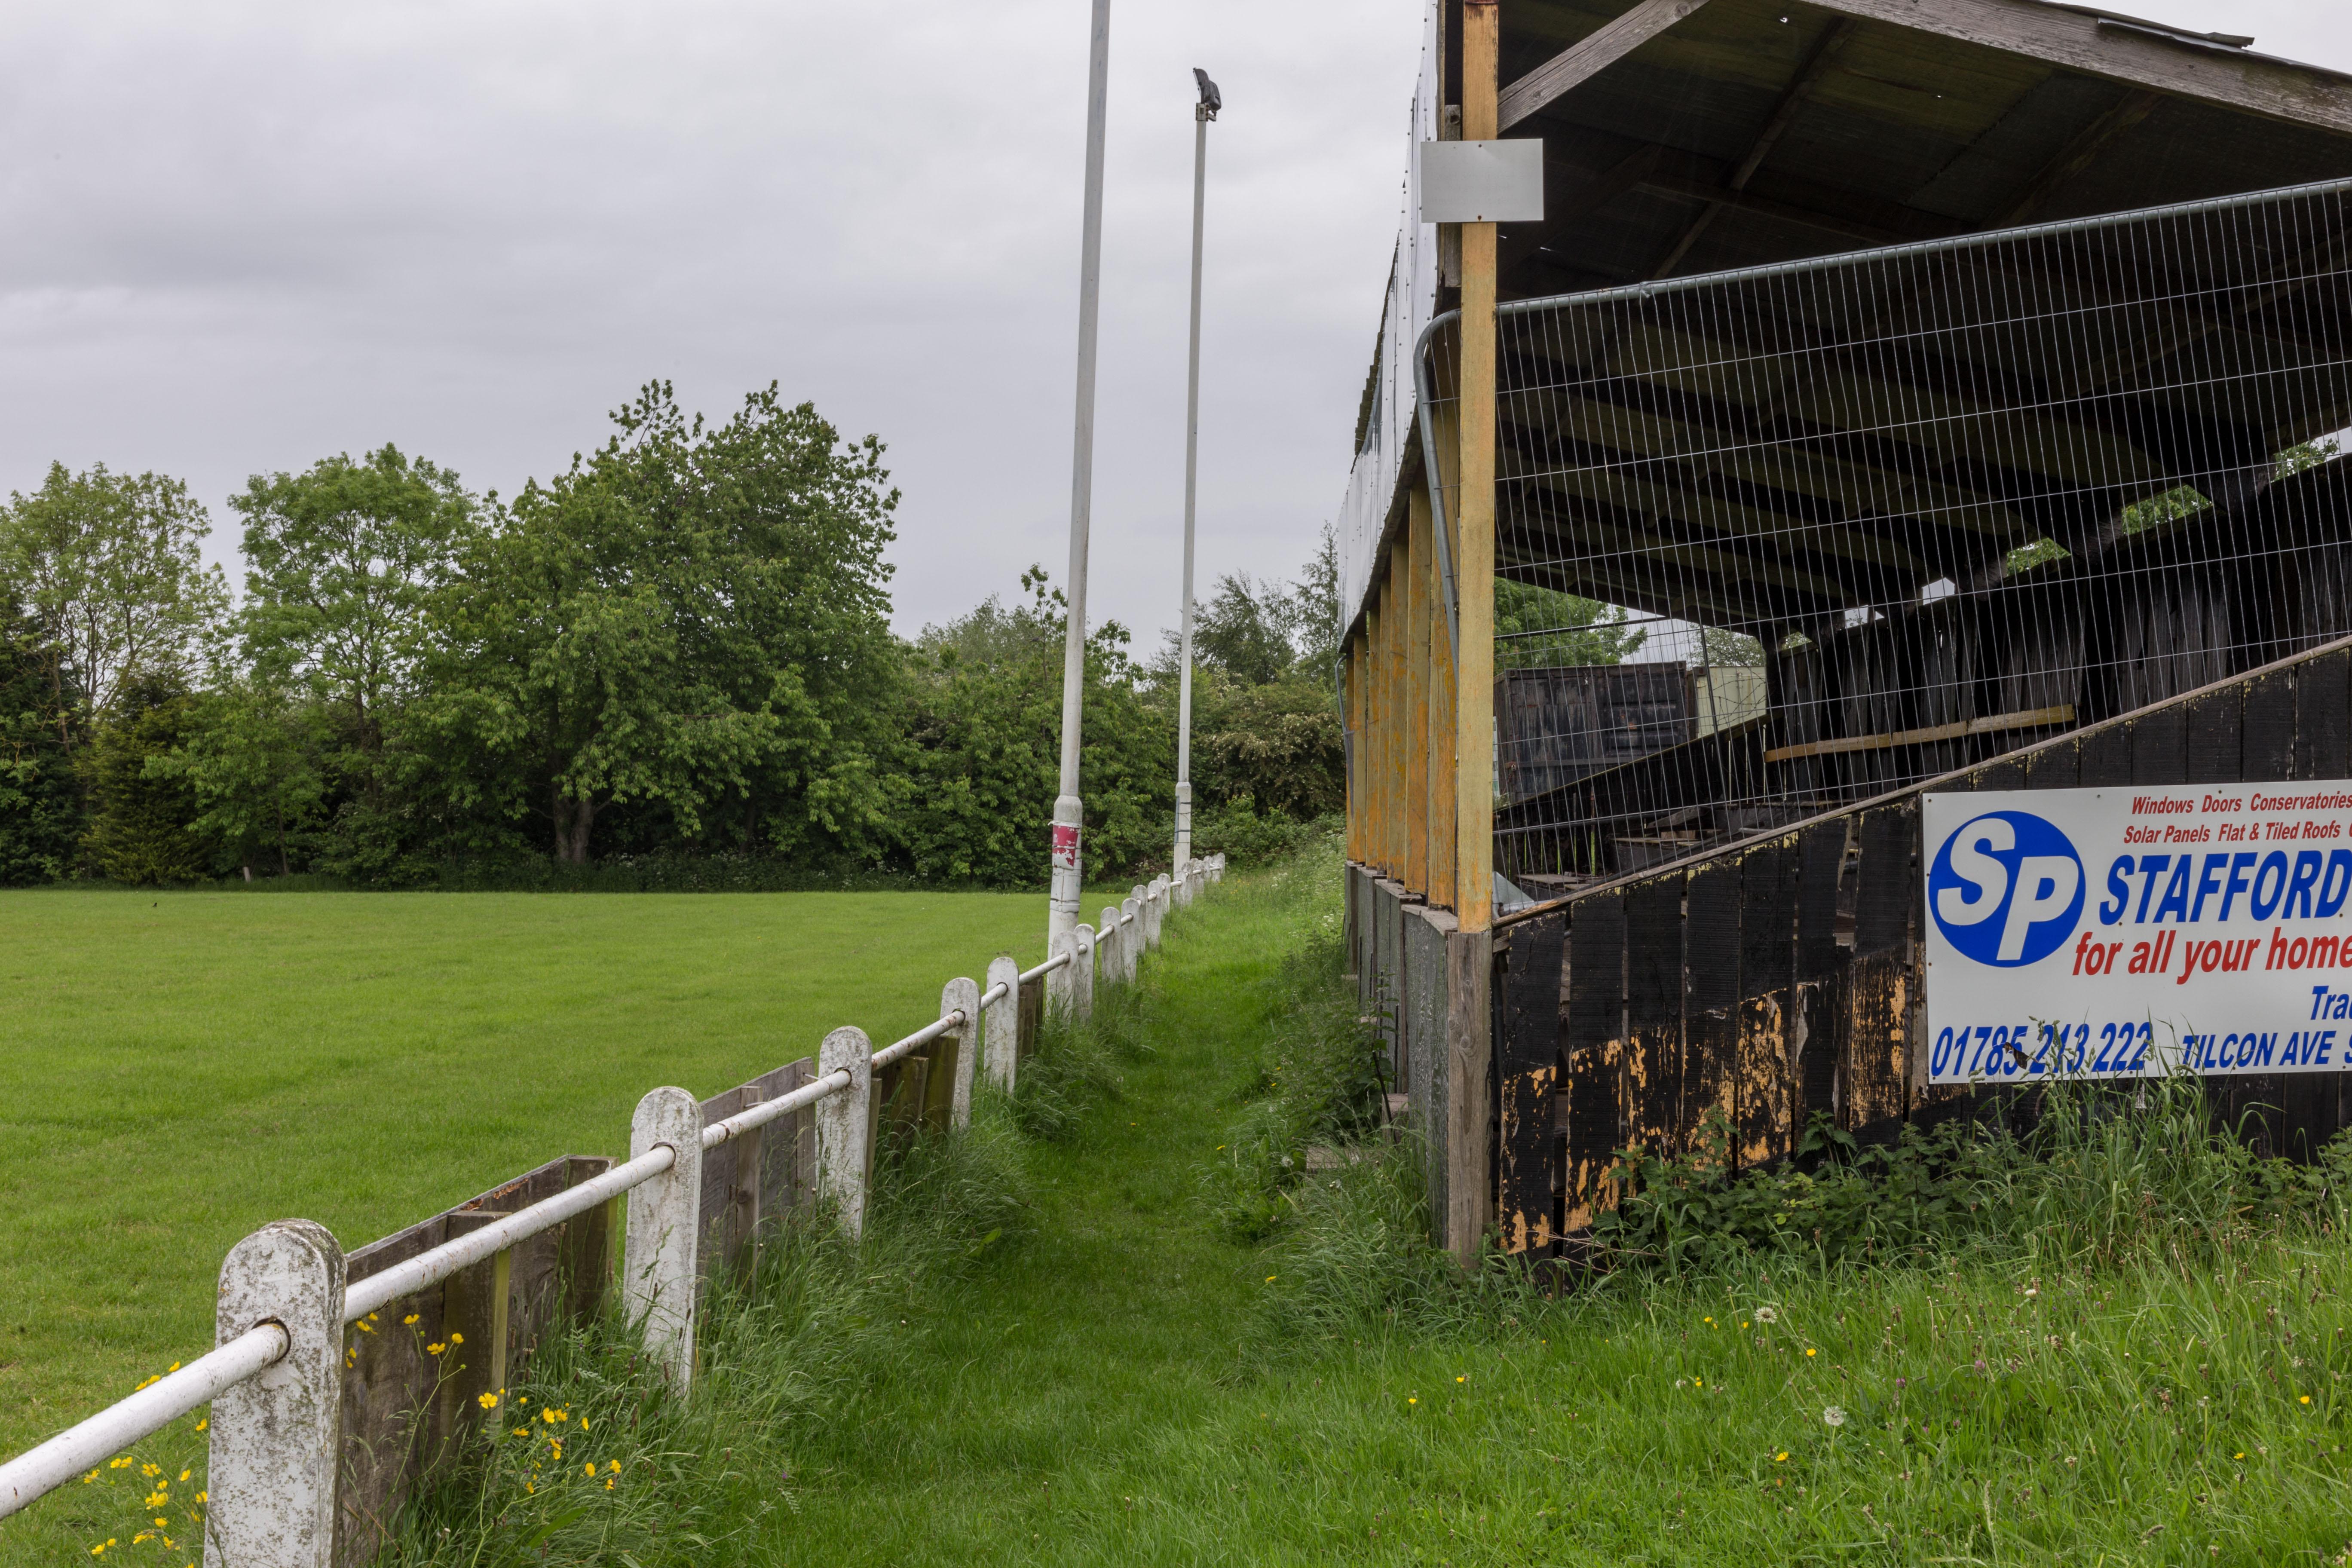 Stafford RFC